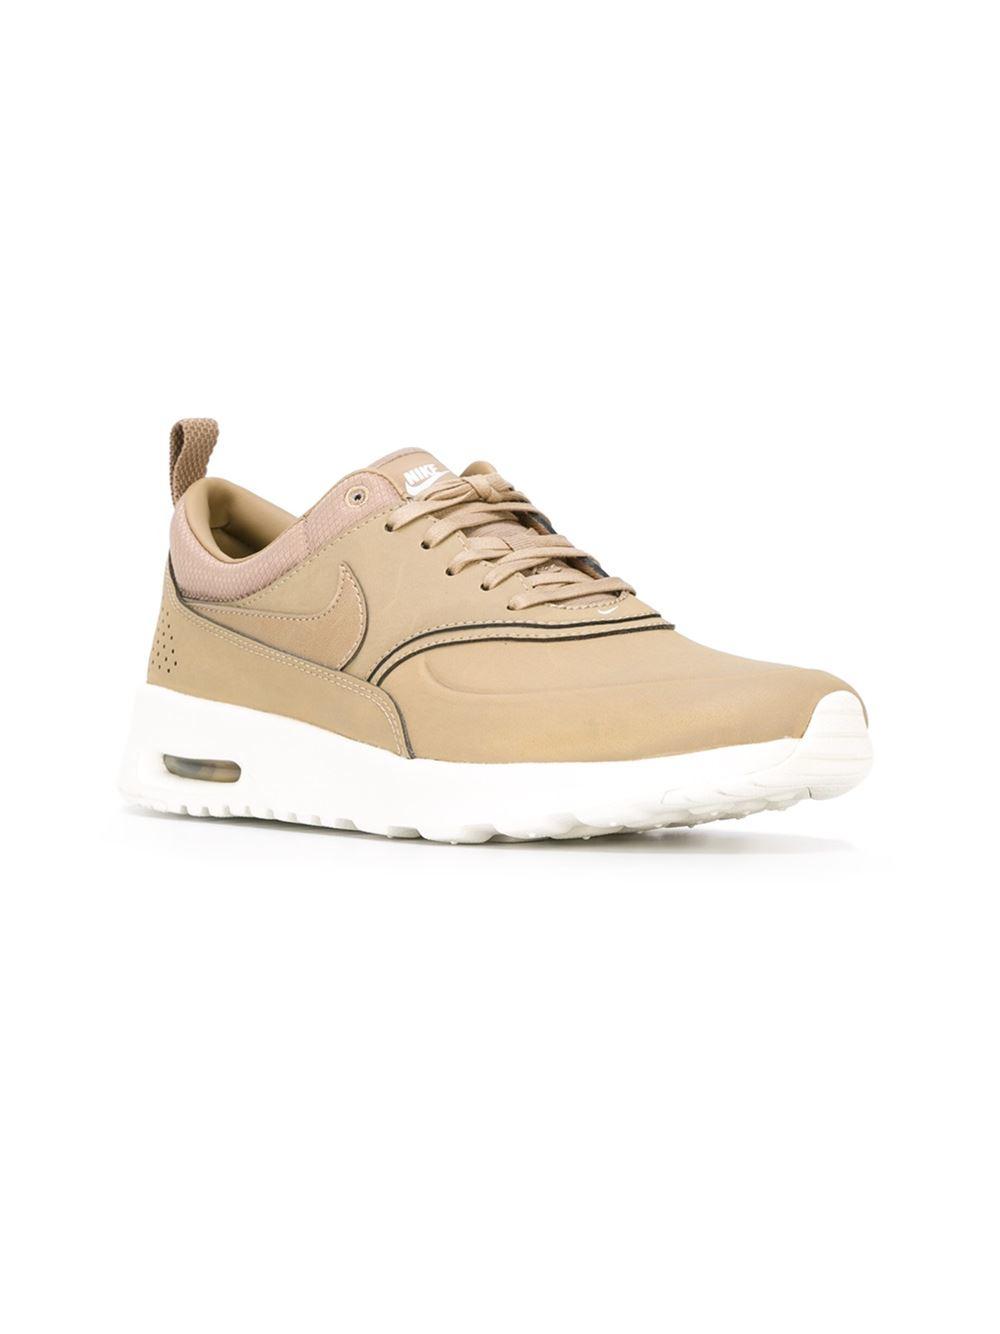 Simple Nike Running Nike Pockwahn Women Shoes(brown) - Nike Running